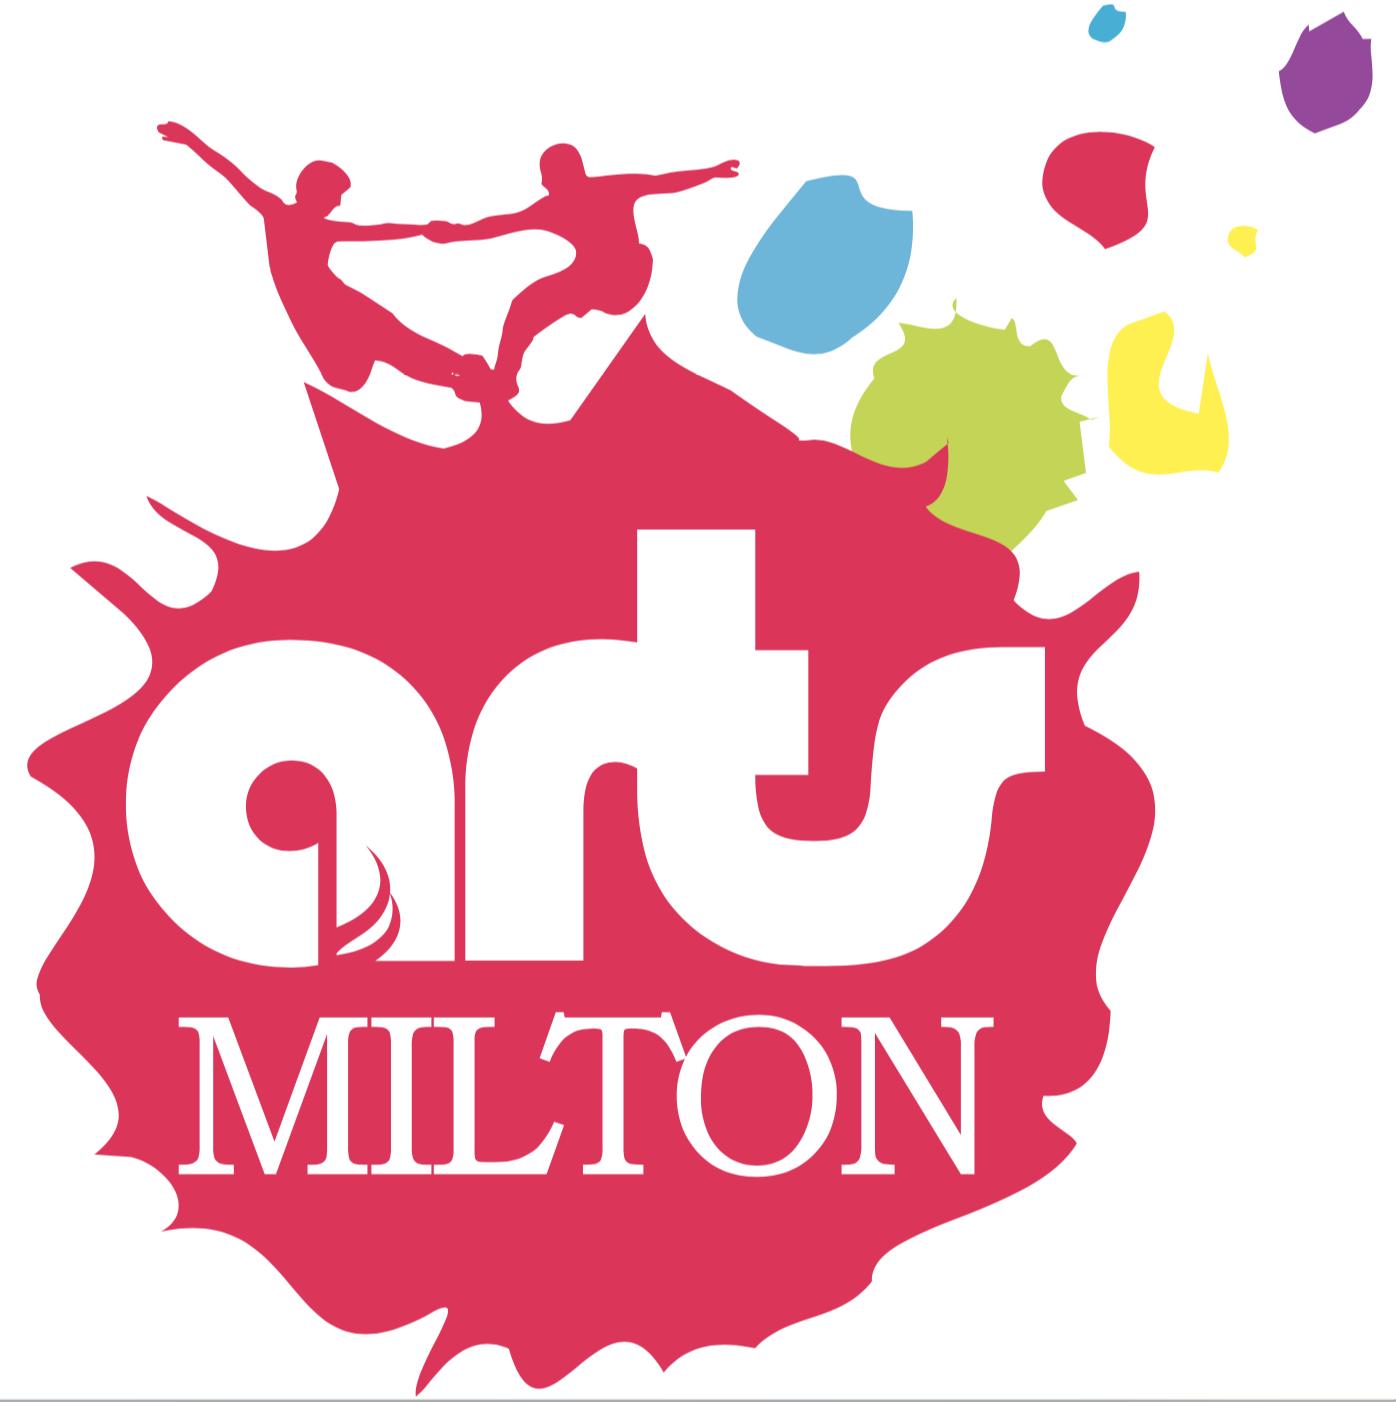 Arts Milton